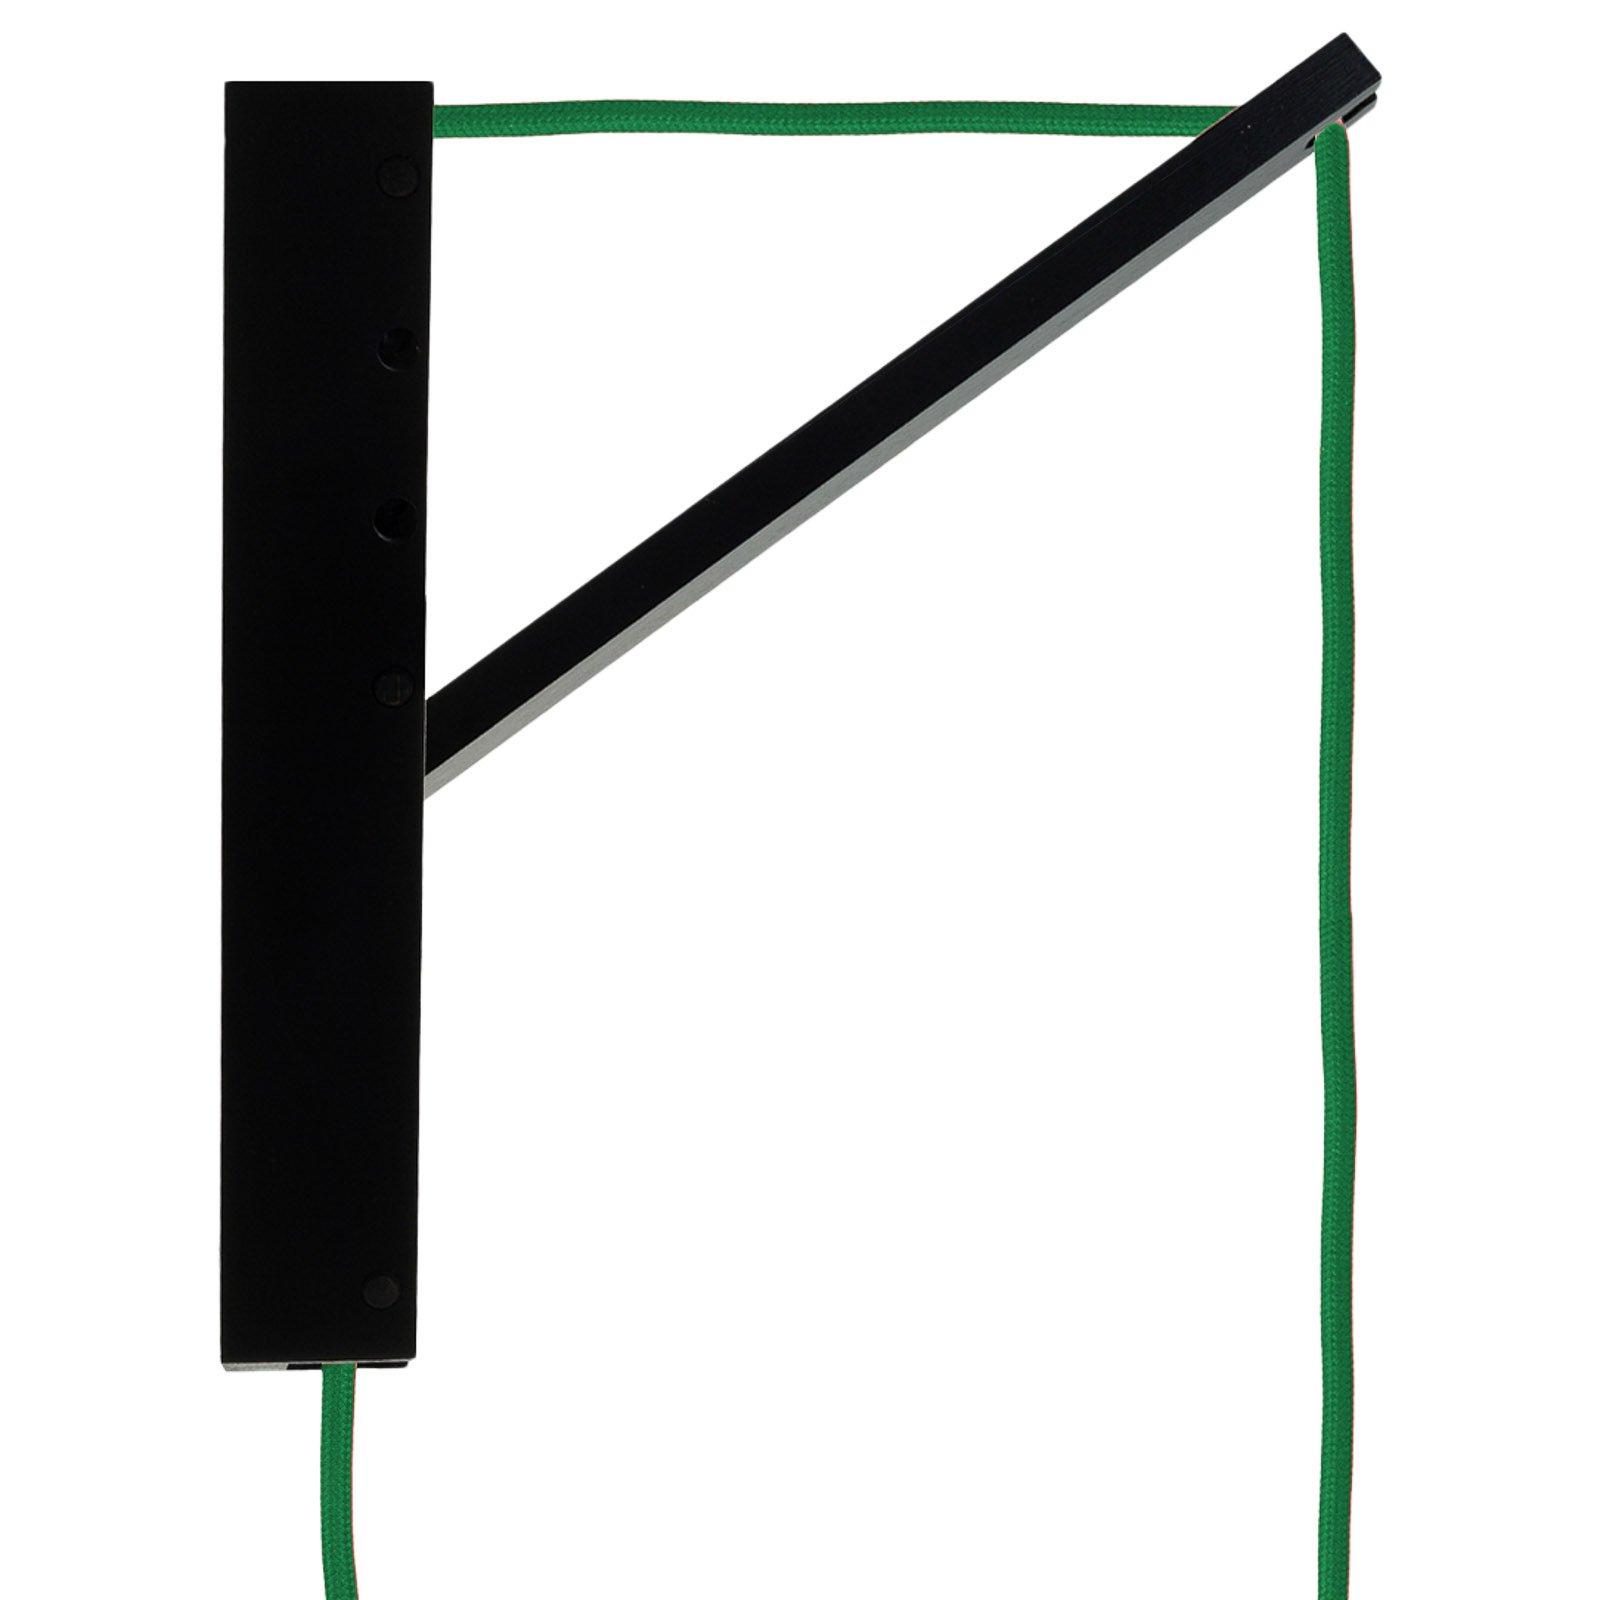 SEGULA Pinocchio-hengelampe svart, kabel grønn